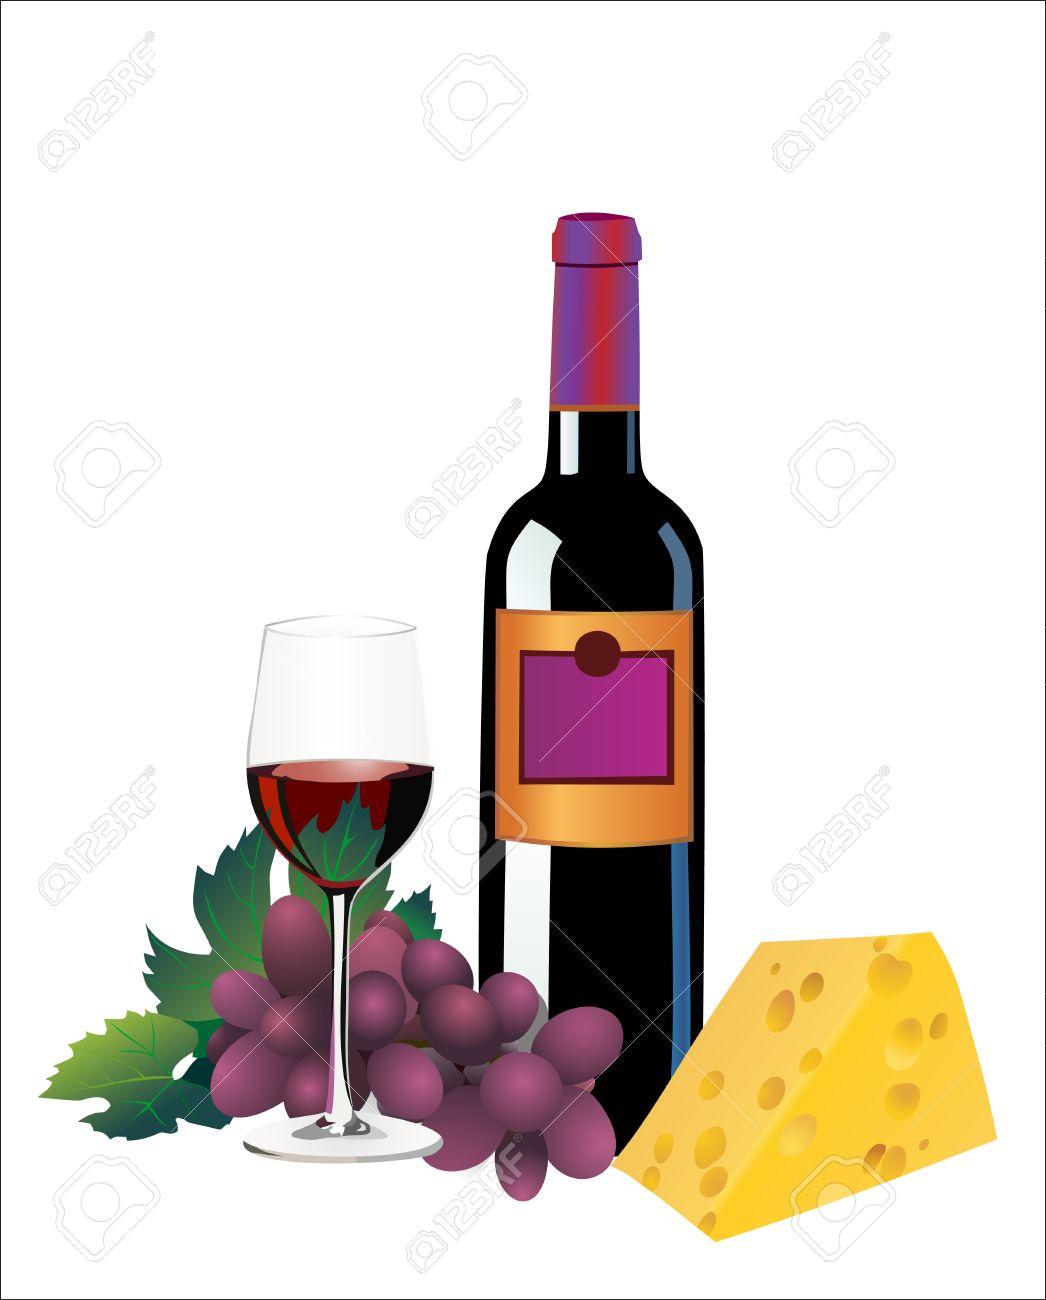 Wine Clipart Images For .-Wine Clipart Images For .-16